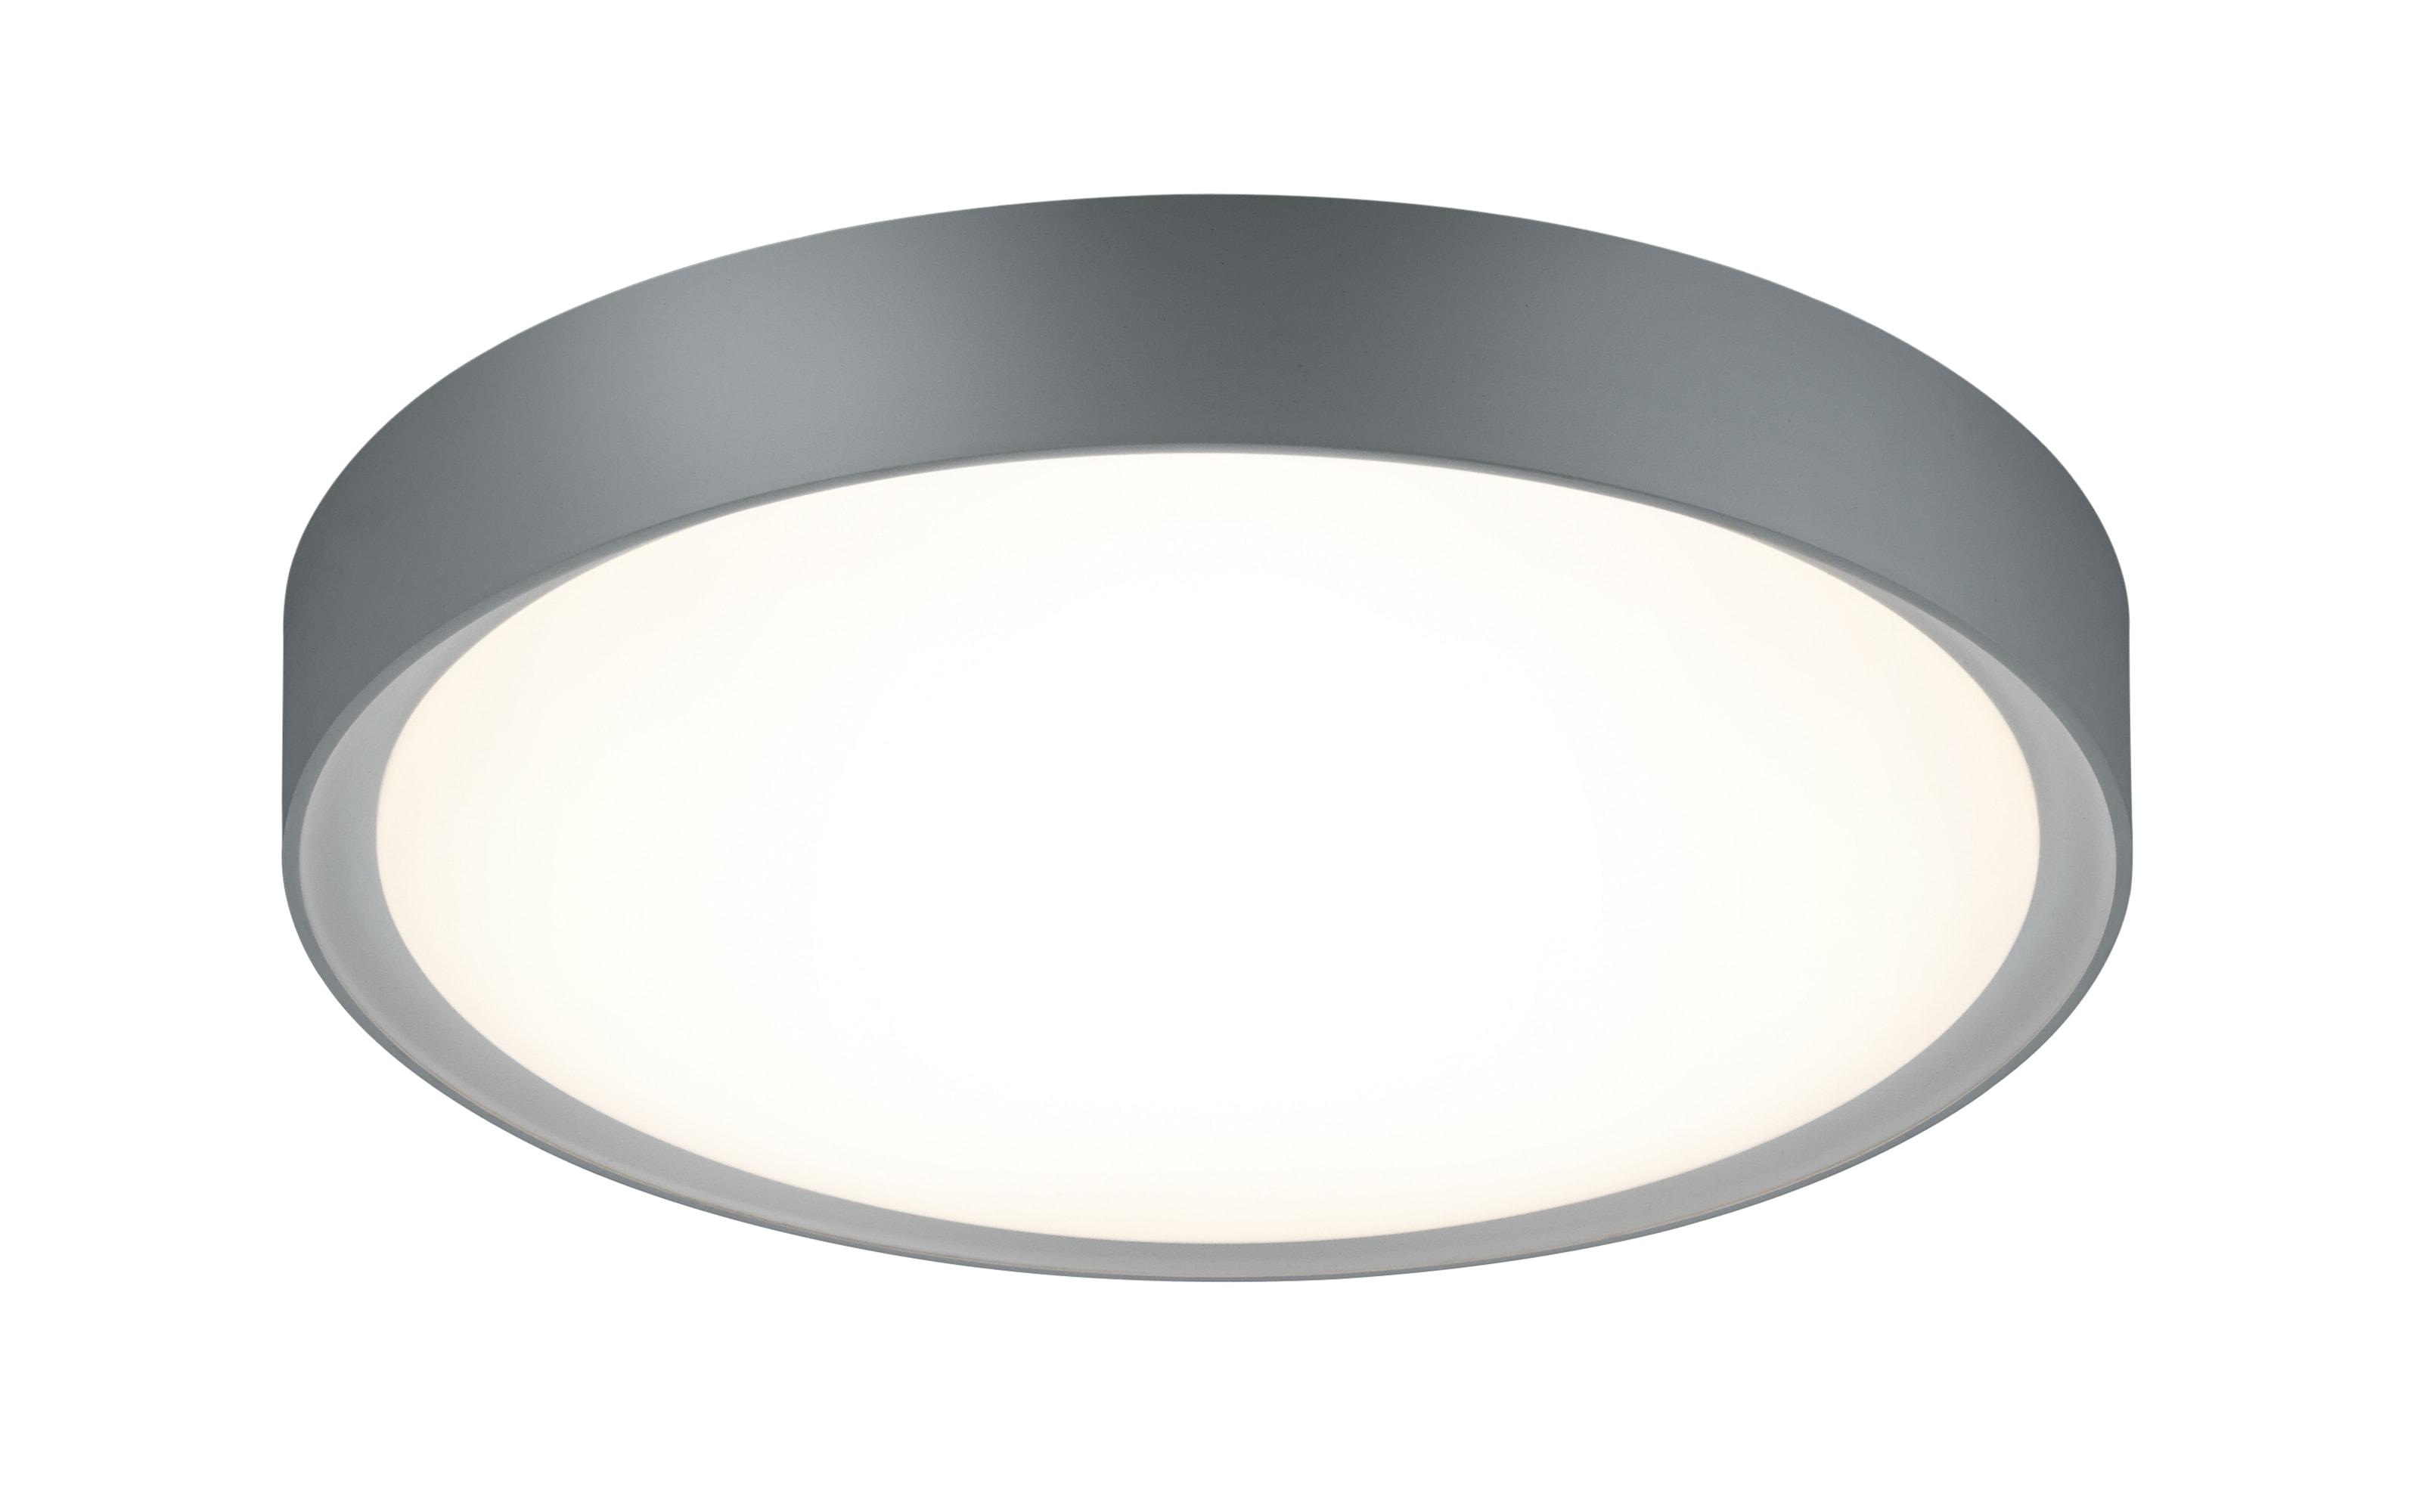 LED-Deckenleuchte Clarimo in titanfarbig, 33 cm